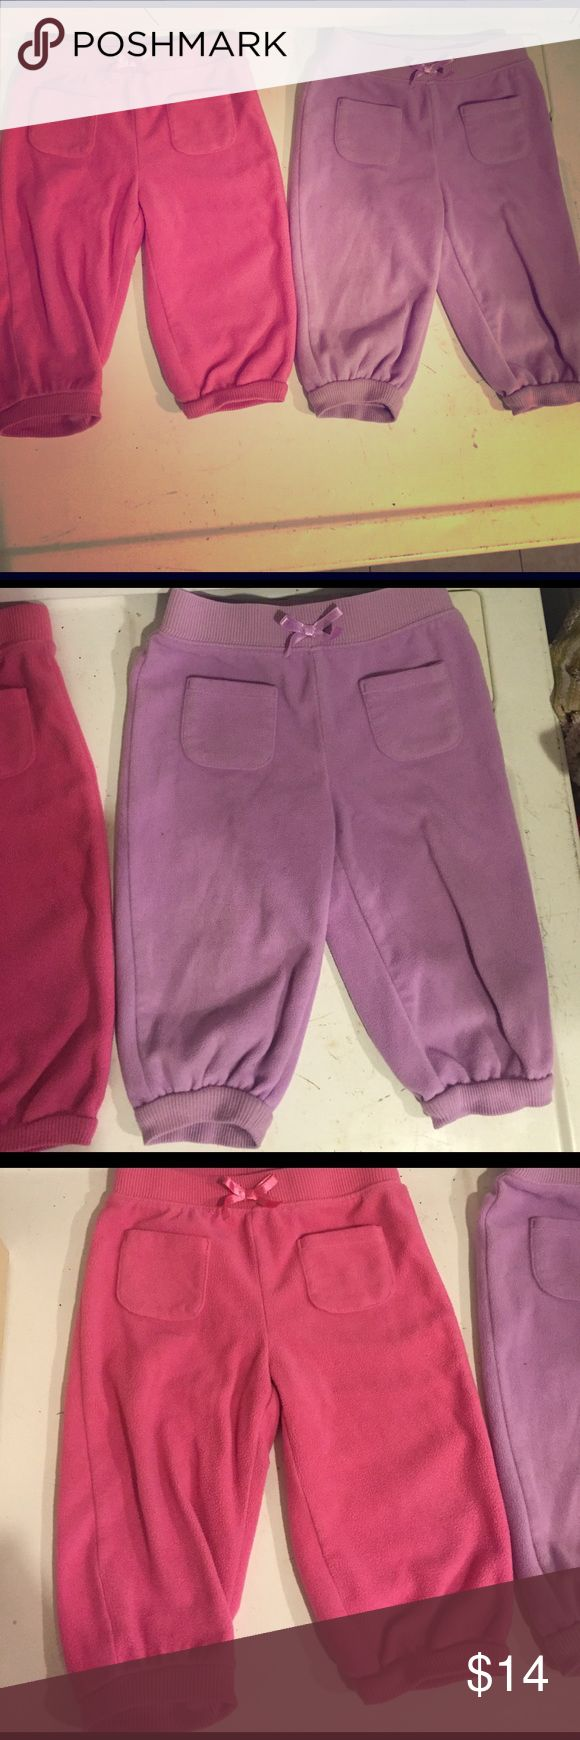 2 pack fleece pants 1 pair of pink fleece pants, 1 pair of lavender fleece pants. Comfy, good condition. jumping beans Bottoms Sweatpants & Joggers